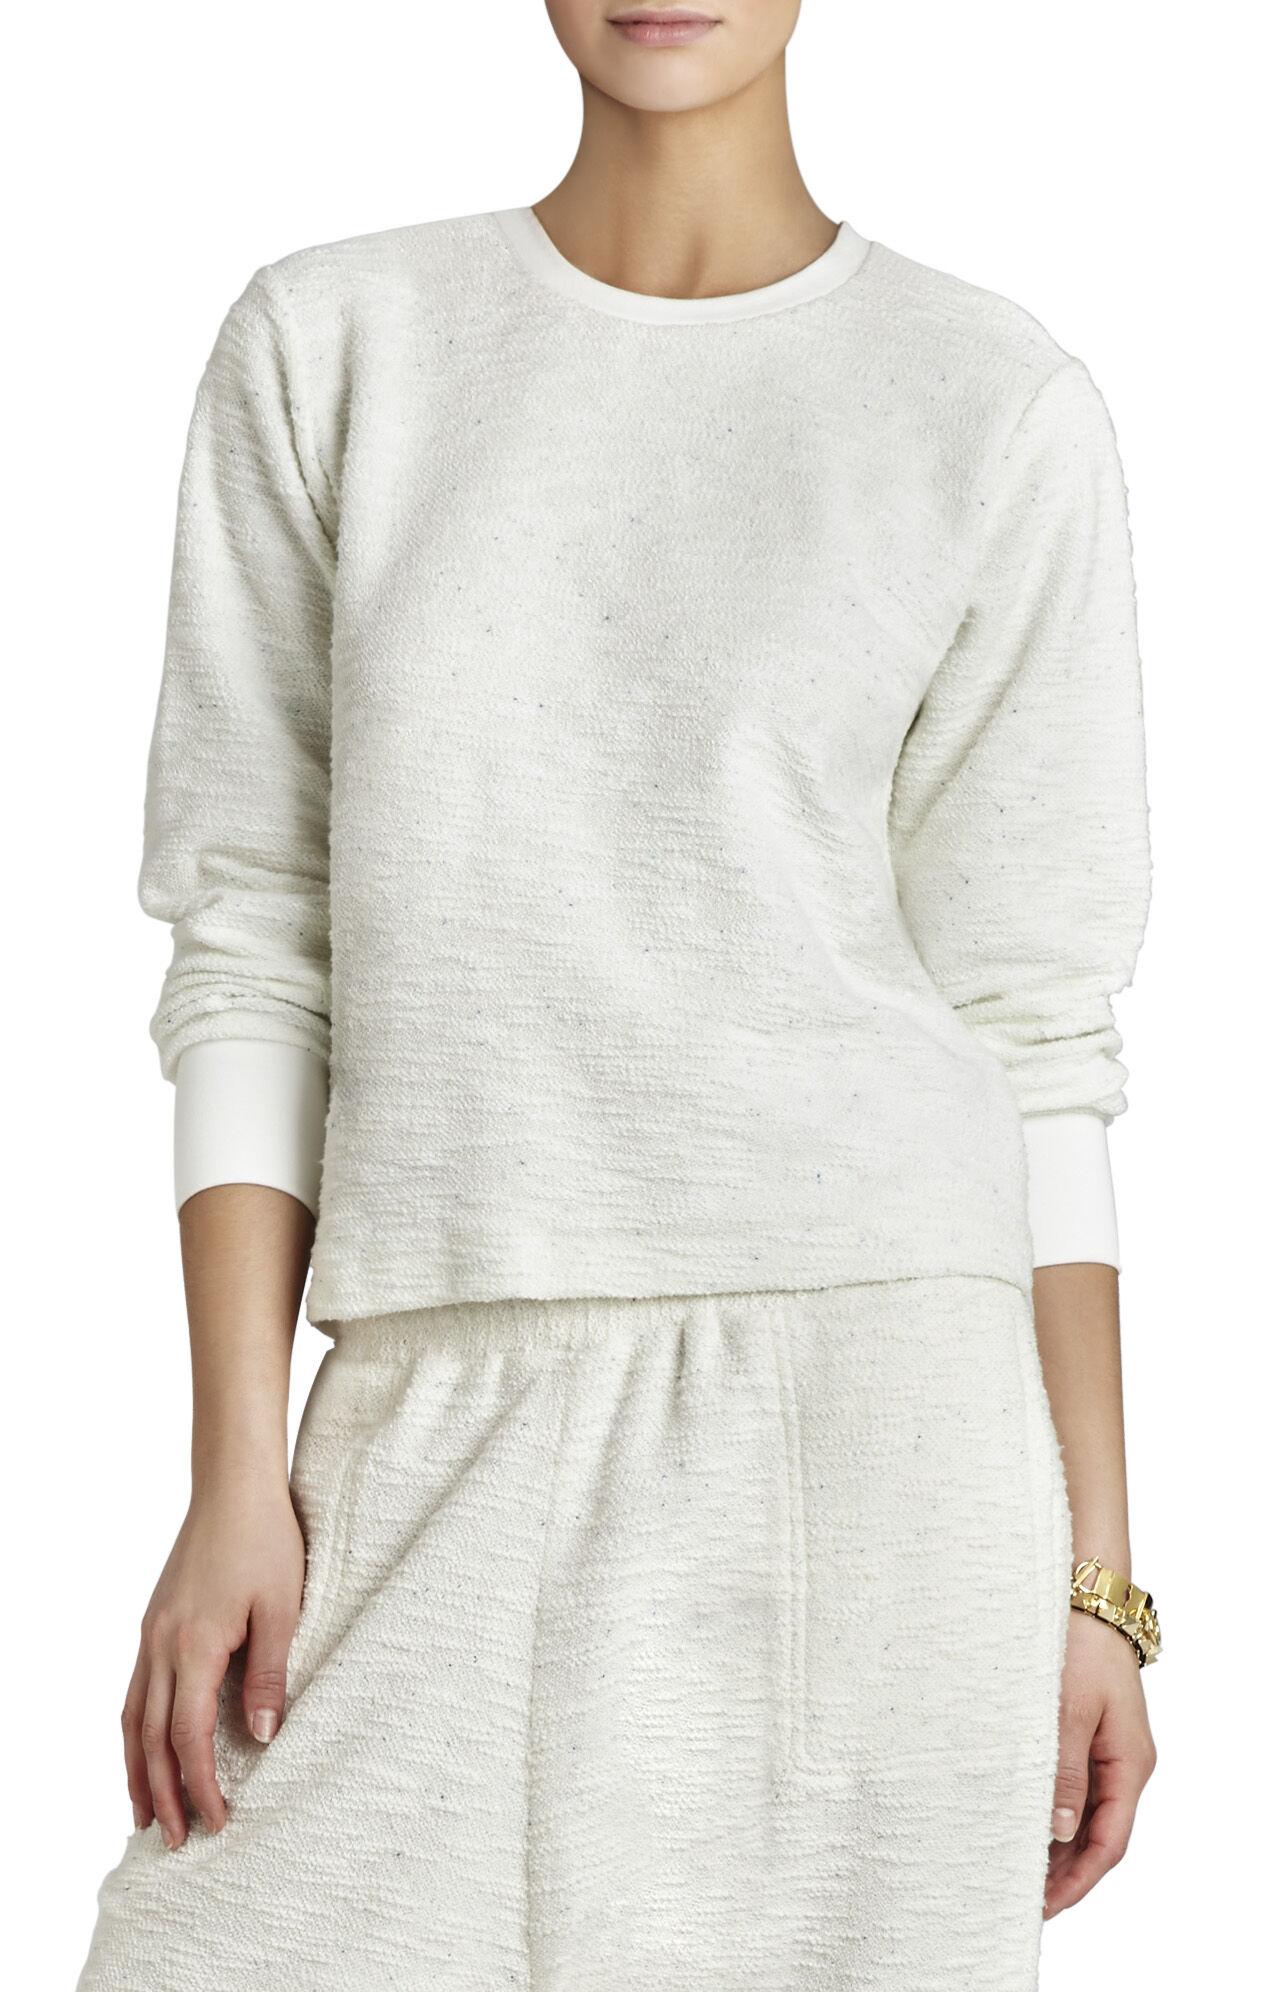 Trista Sweatshirt